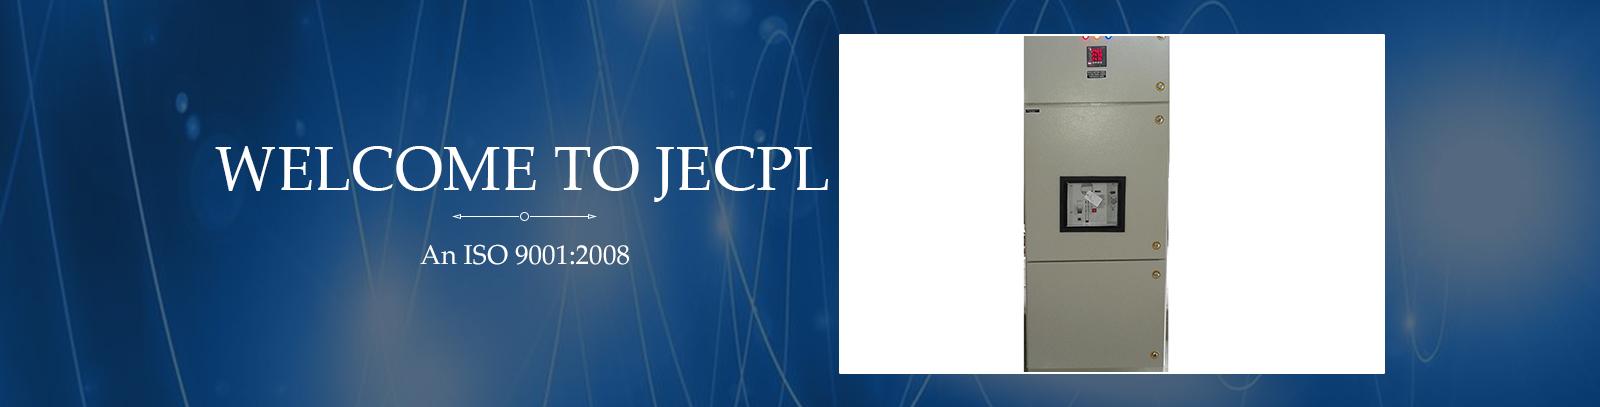 jecpl banner